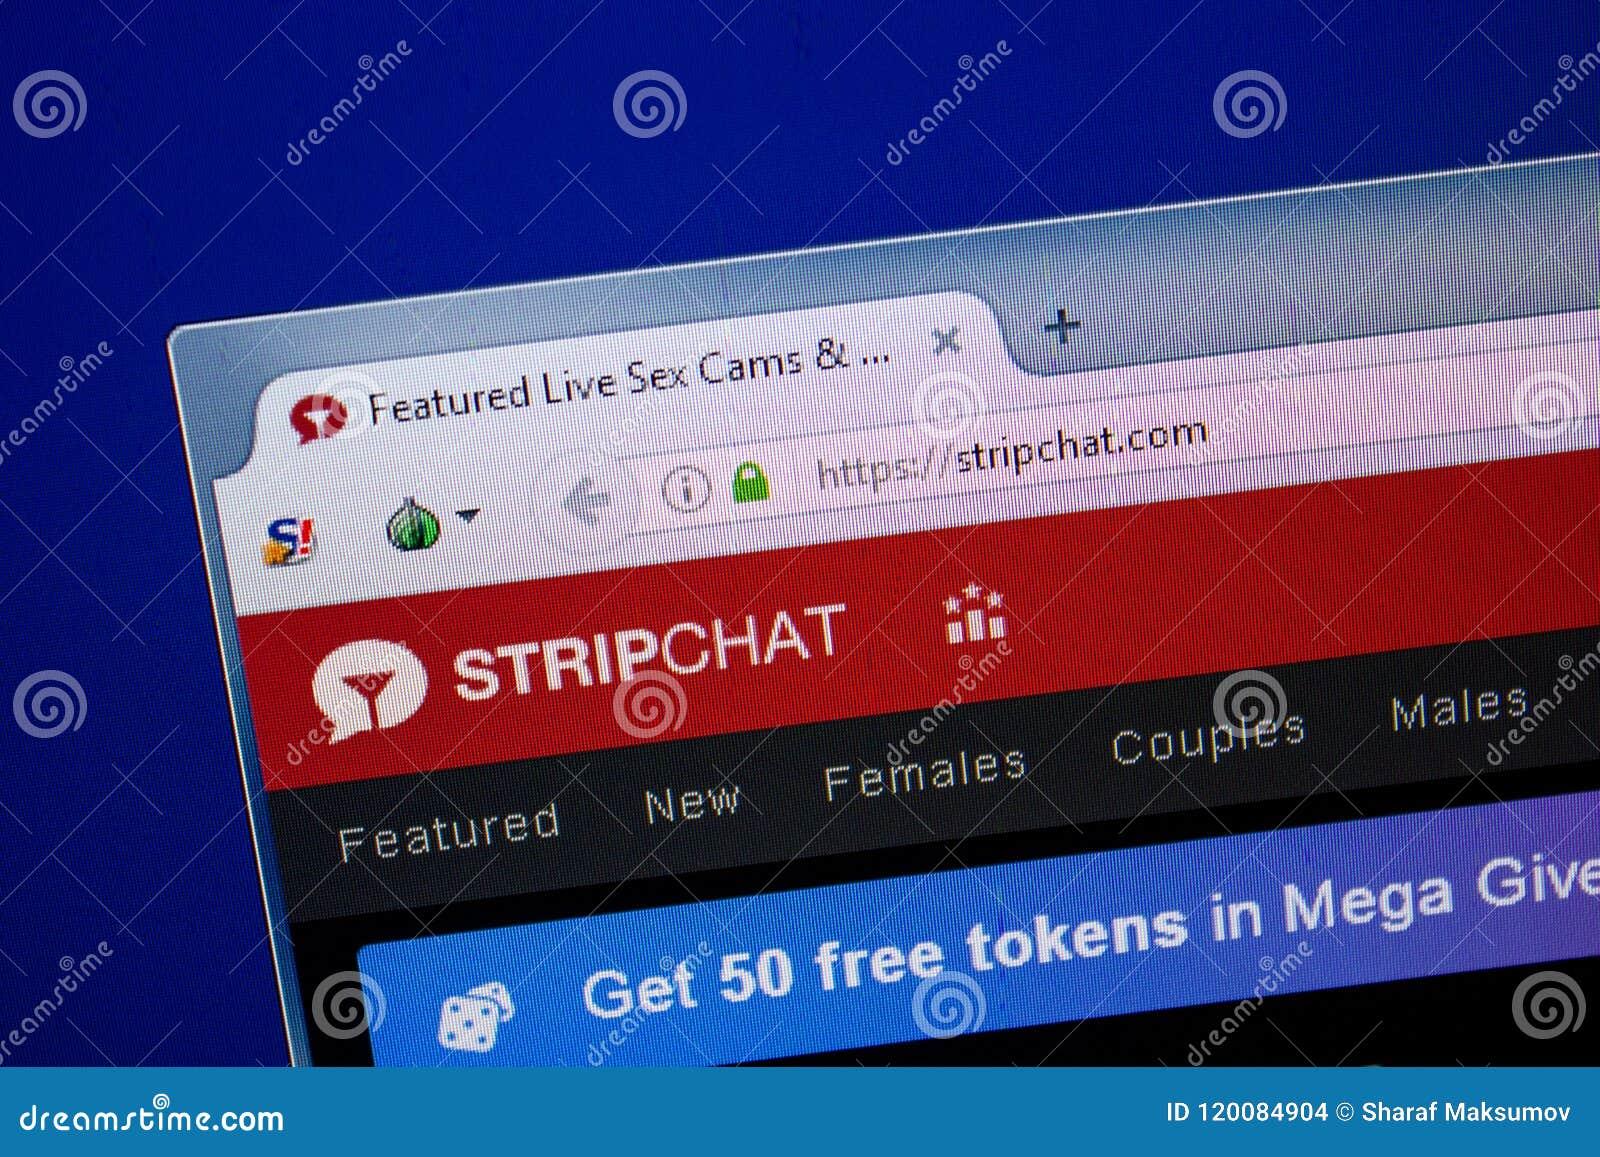 Stripchat Com